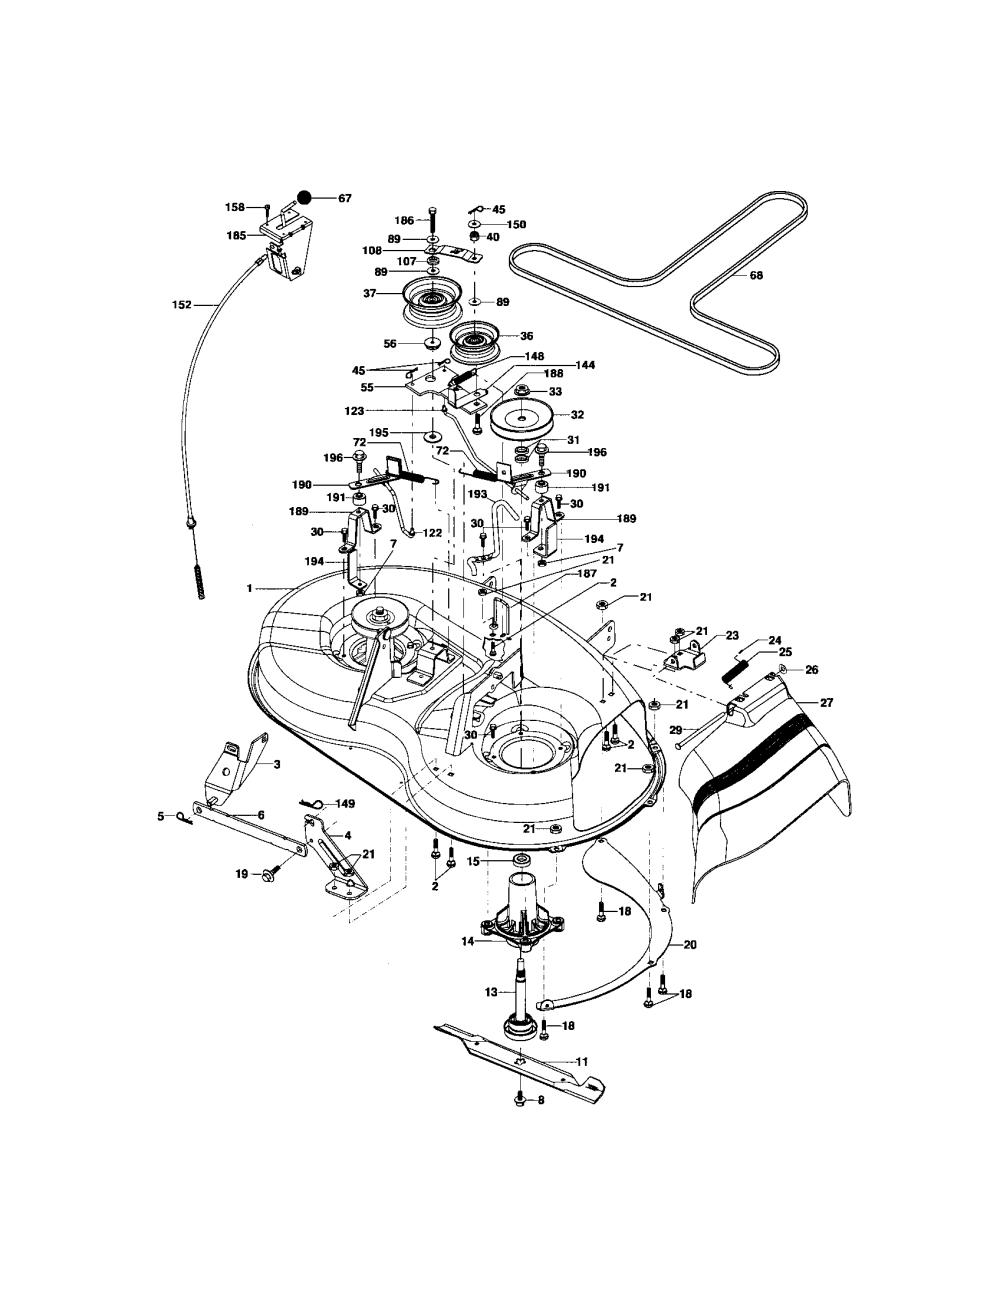 medium resolution of looking for craftsman model 917275351 front engine lawn tractor craftsman lt1000 mower deck parts diagram craftsman lt 2000 mower